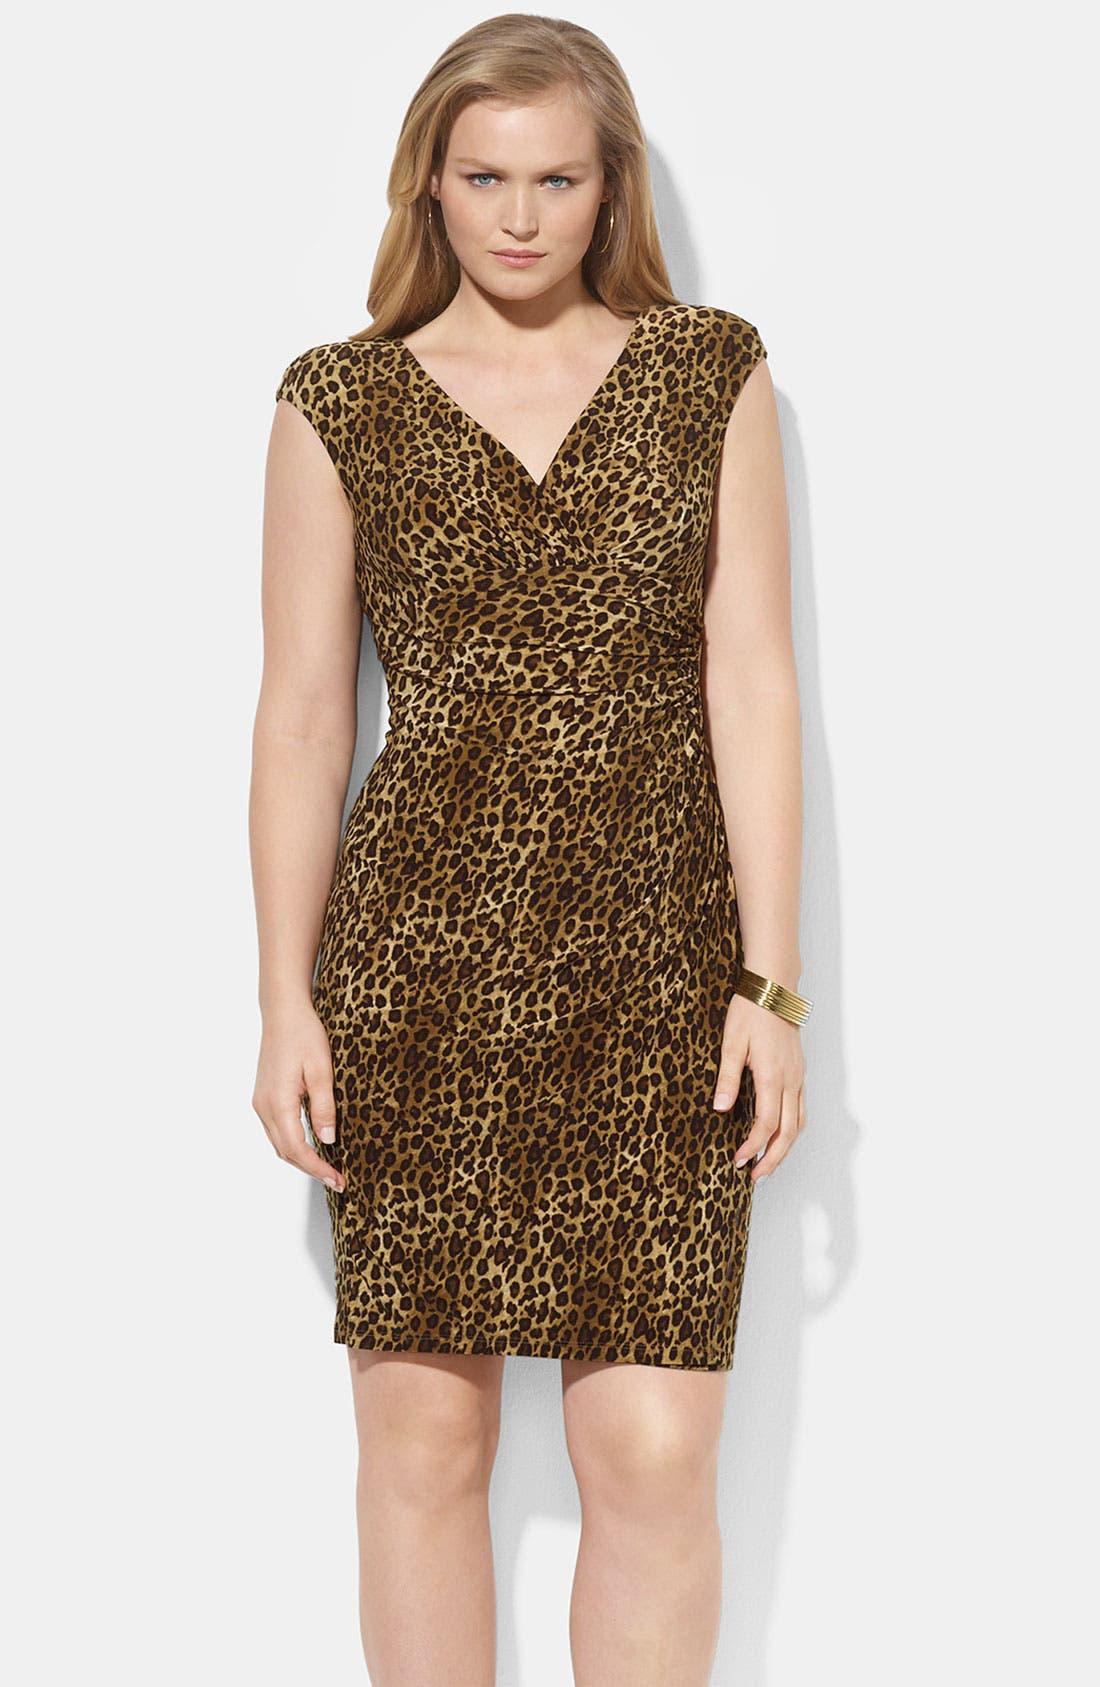 Alternate Image 1 Selected - Lauren Ralph Lauren Print Dress (Plus)